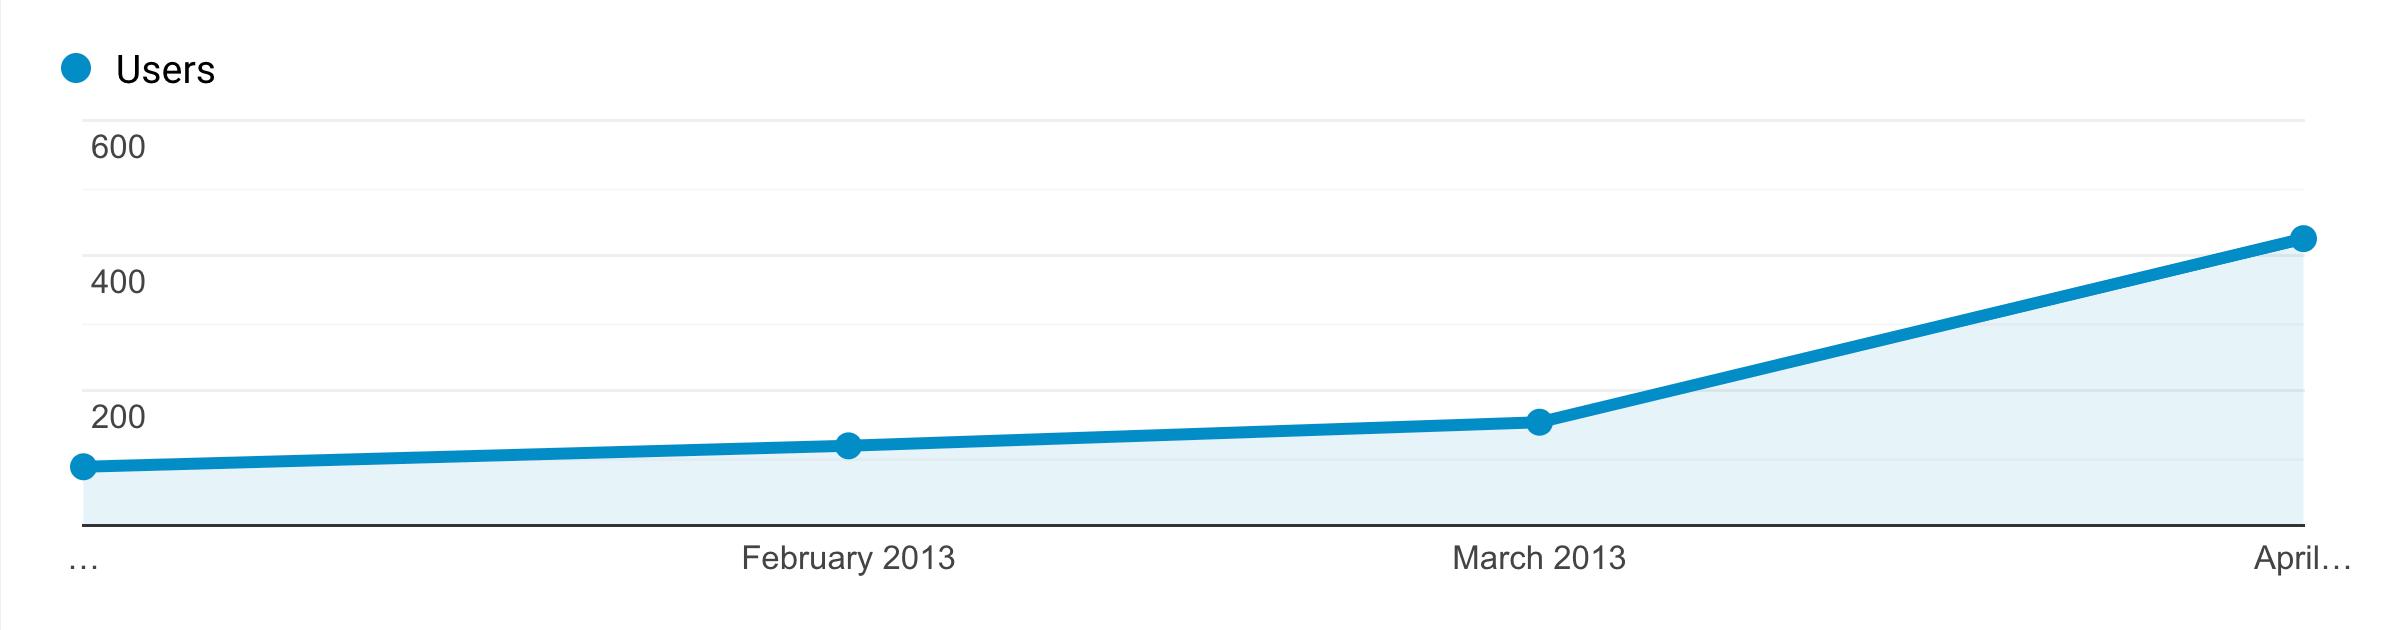 traffic graph months